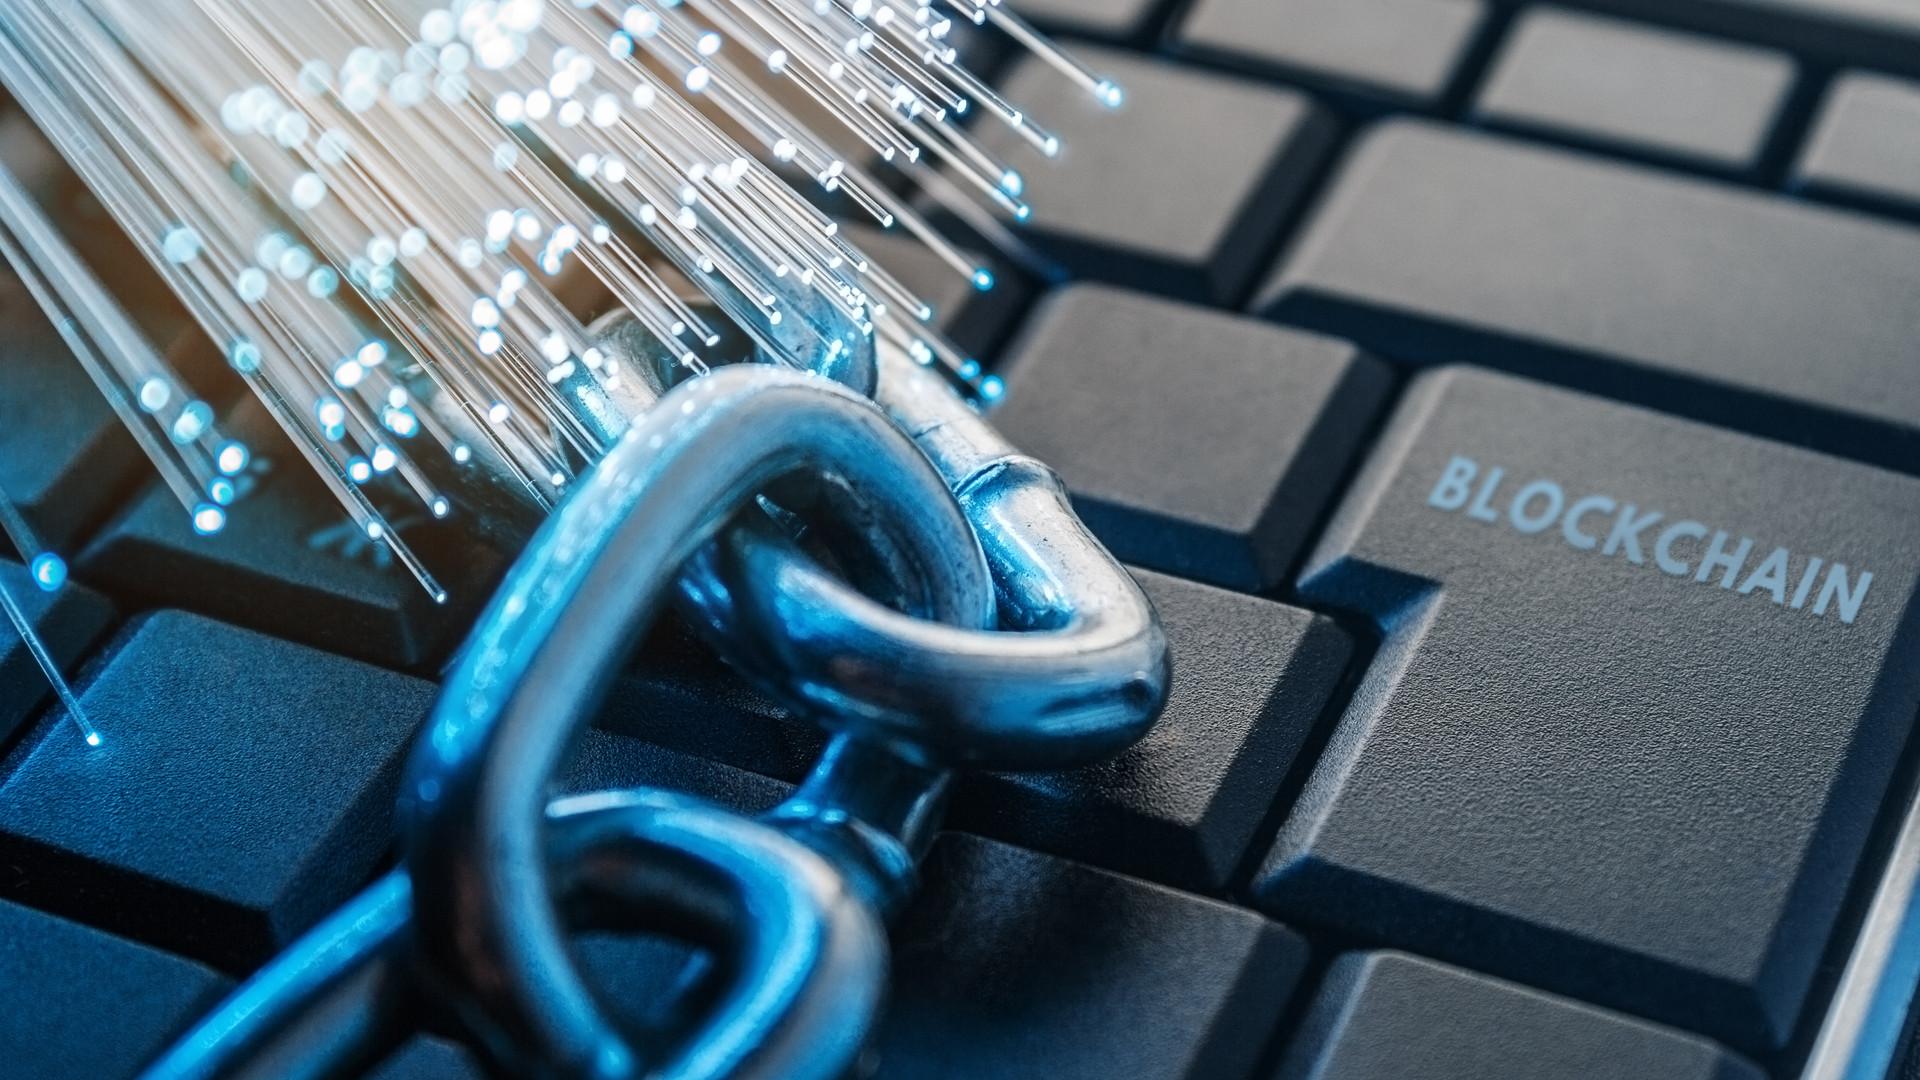 blockchain technology concept. The chain